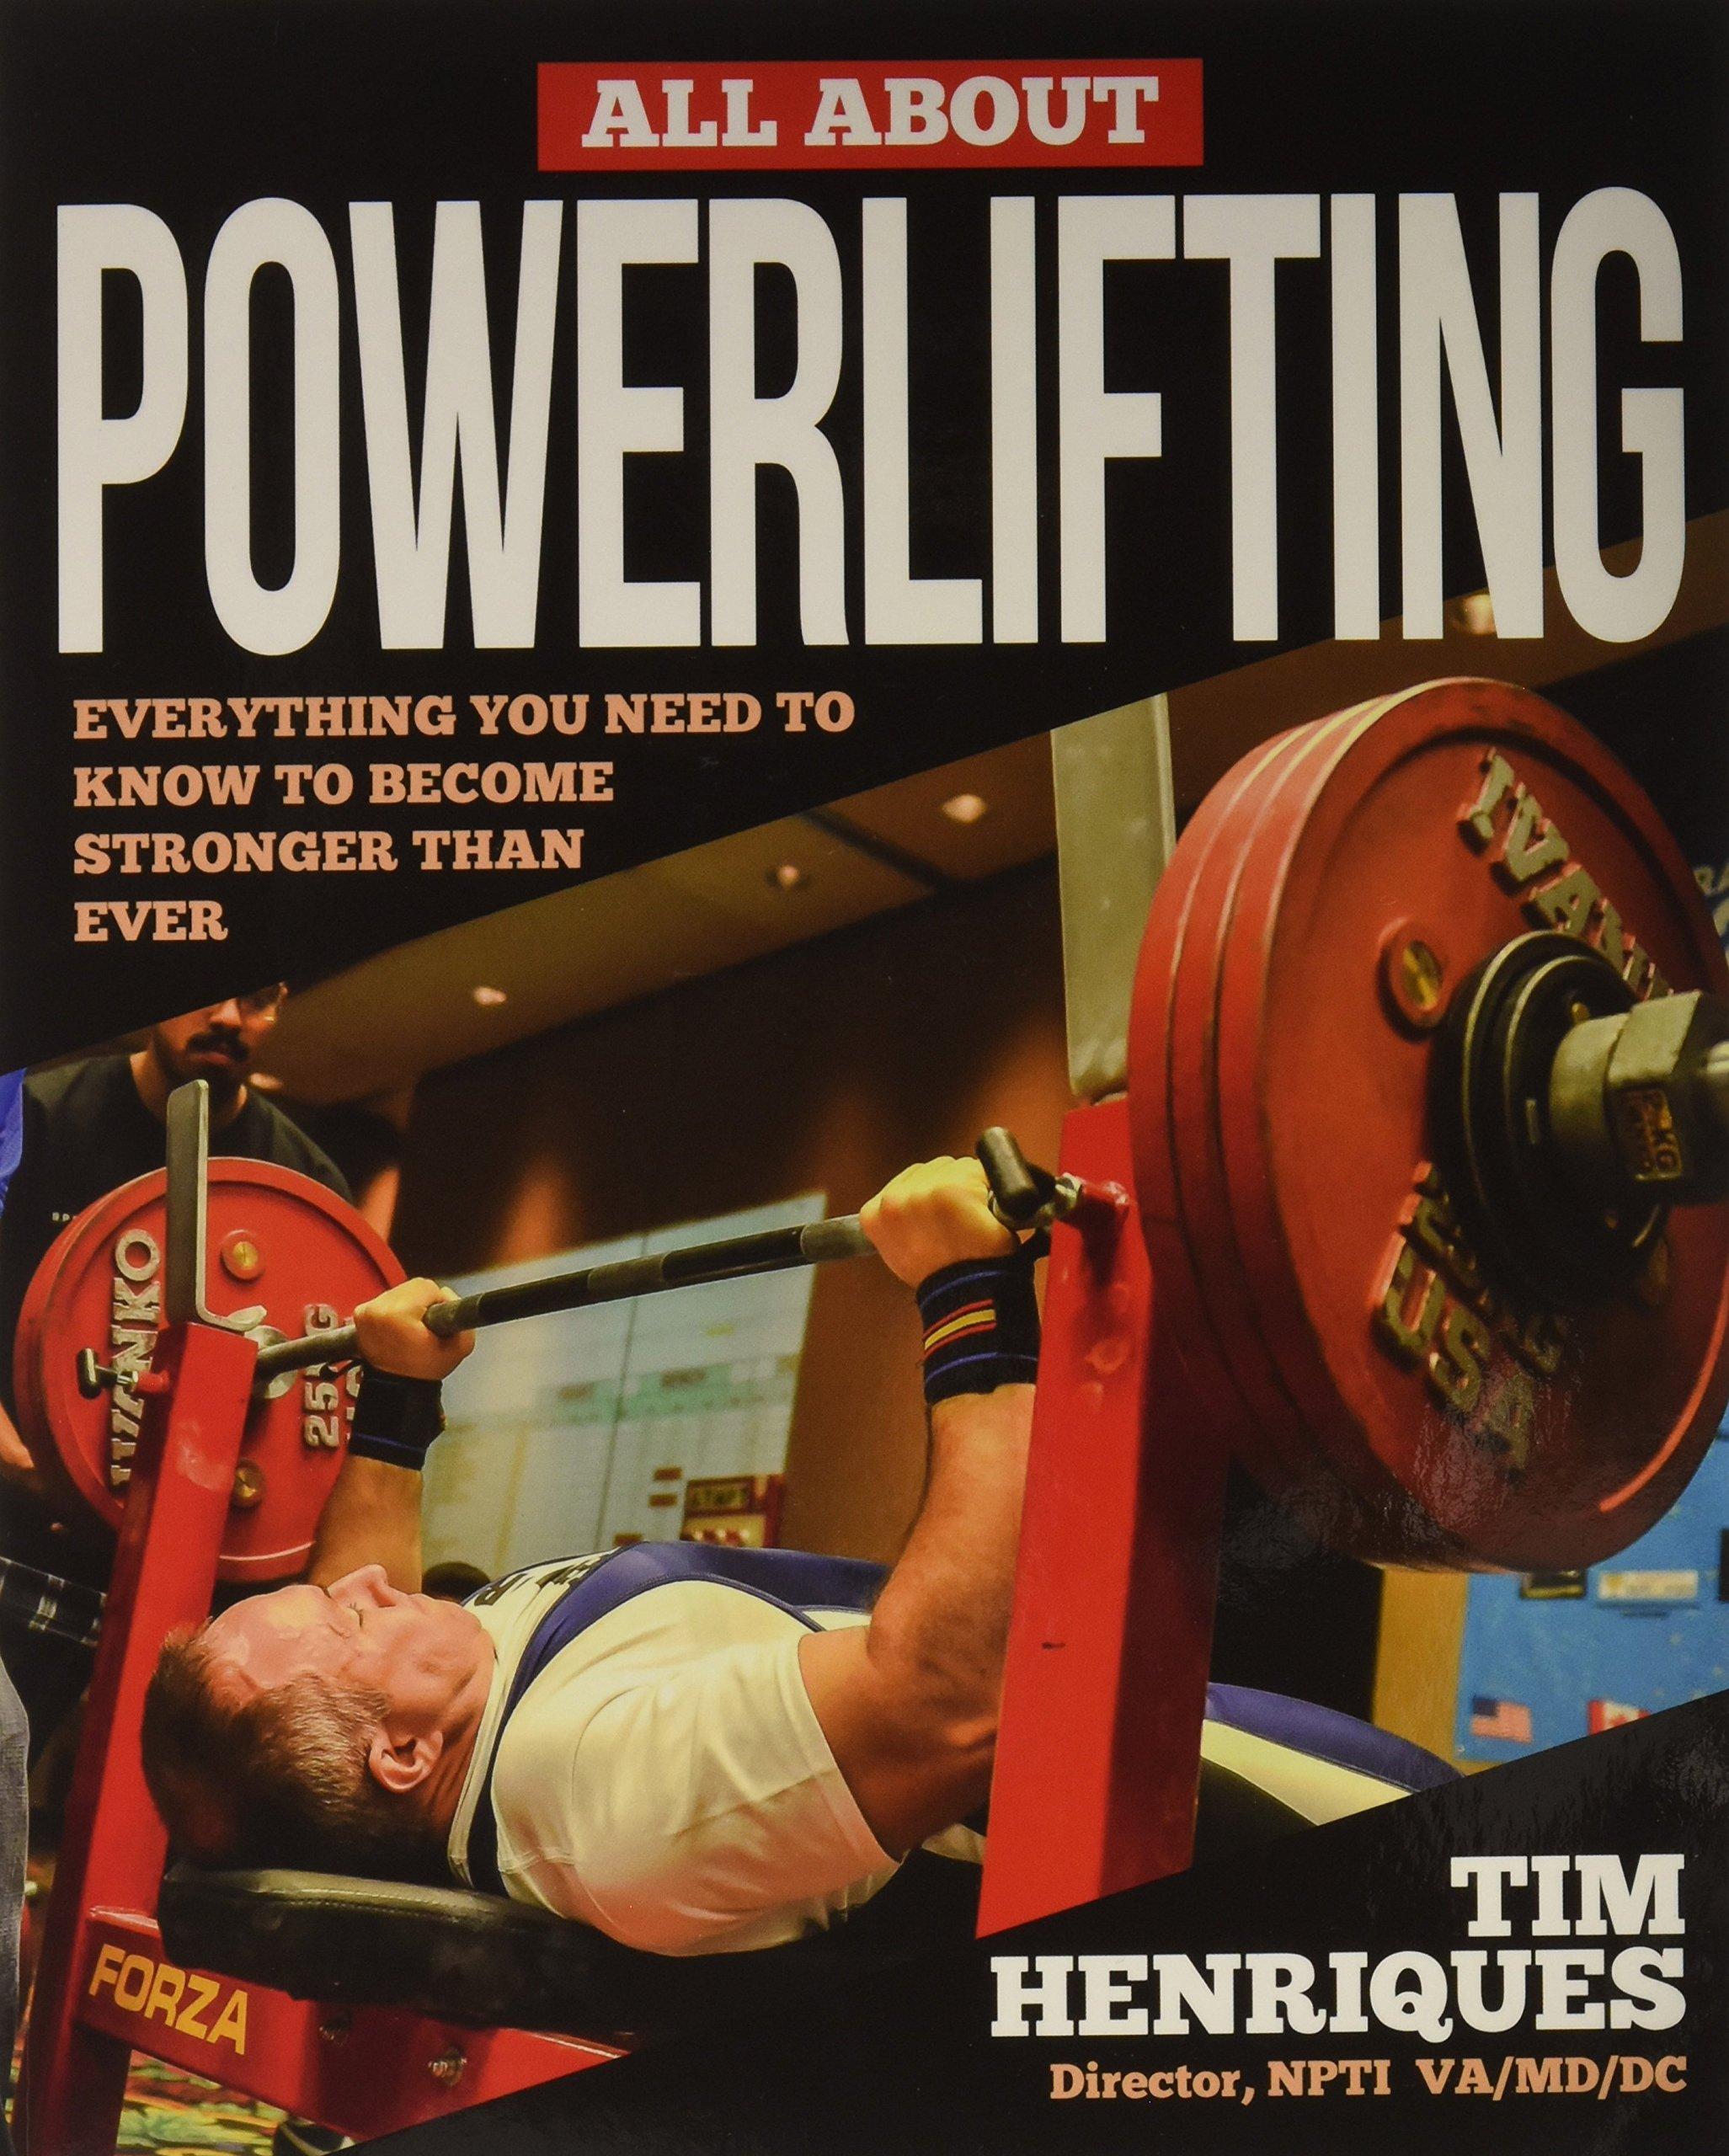 Henriques Tim Amazon itAll Powerlifting Libri About XlOZiuTPkw